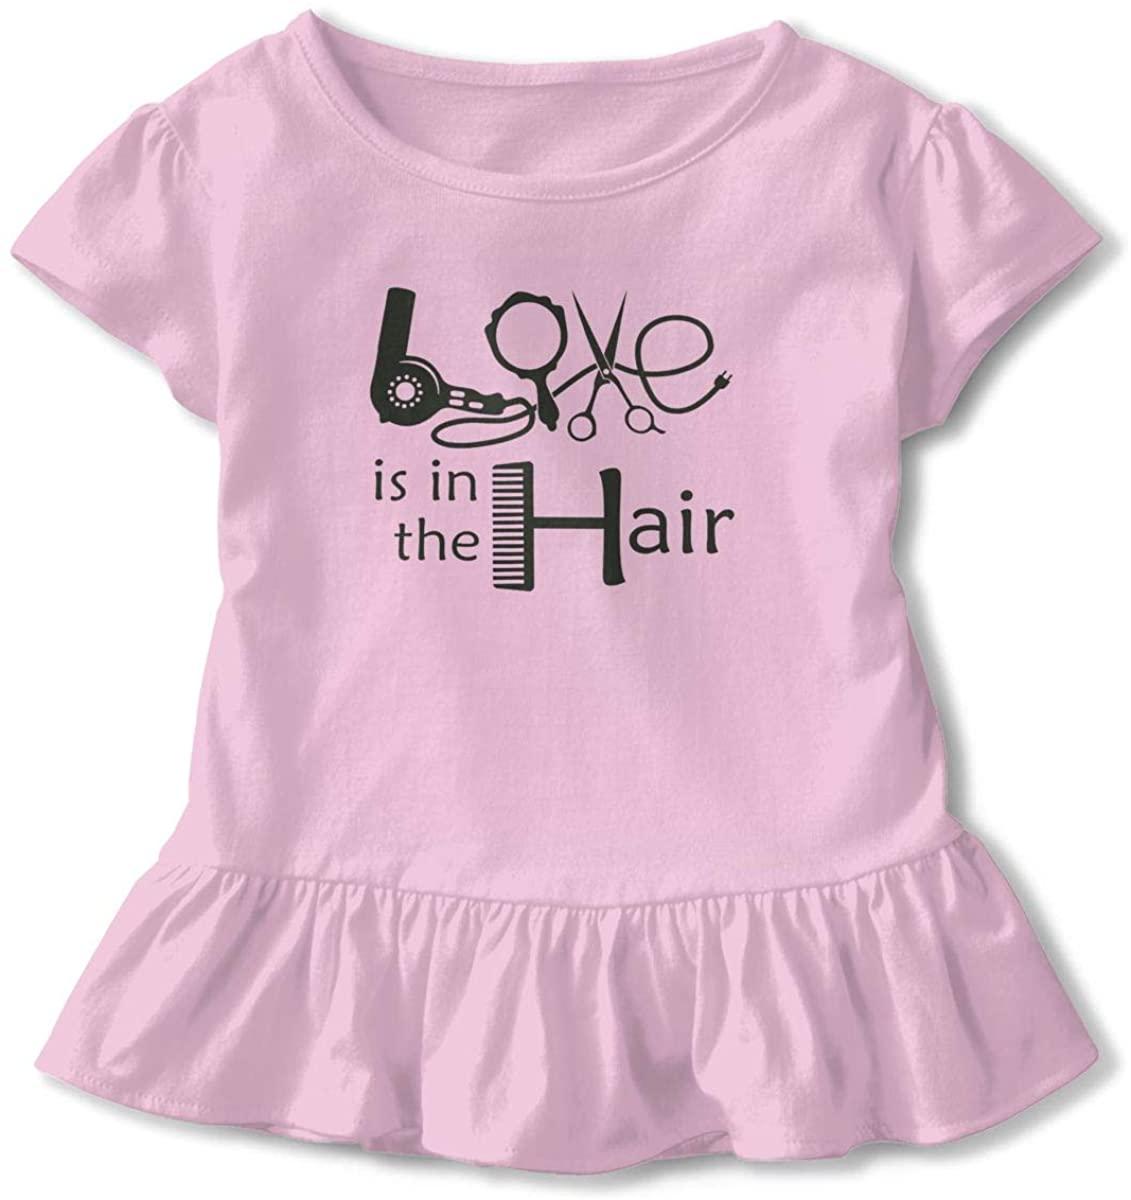 Kids Love is in The Hair Toddler Short Sleeve T Shirt Children Girls Cotton Graphic Tee Soft Dress (2-6T)